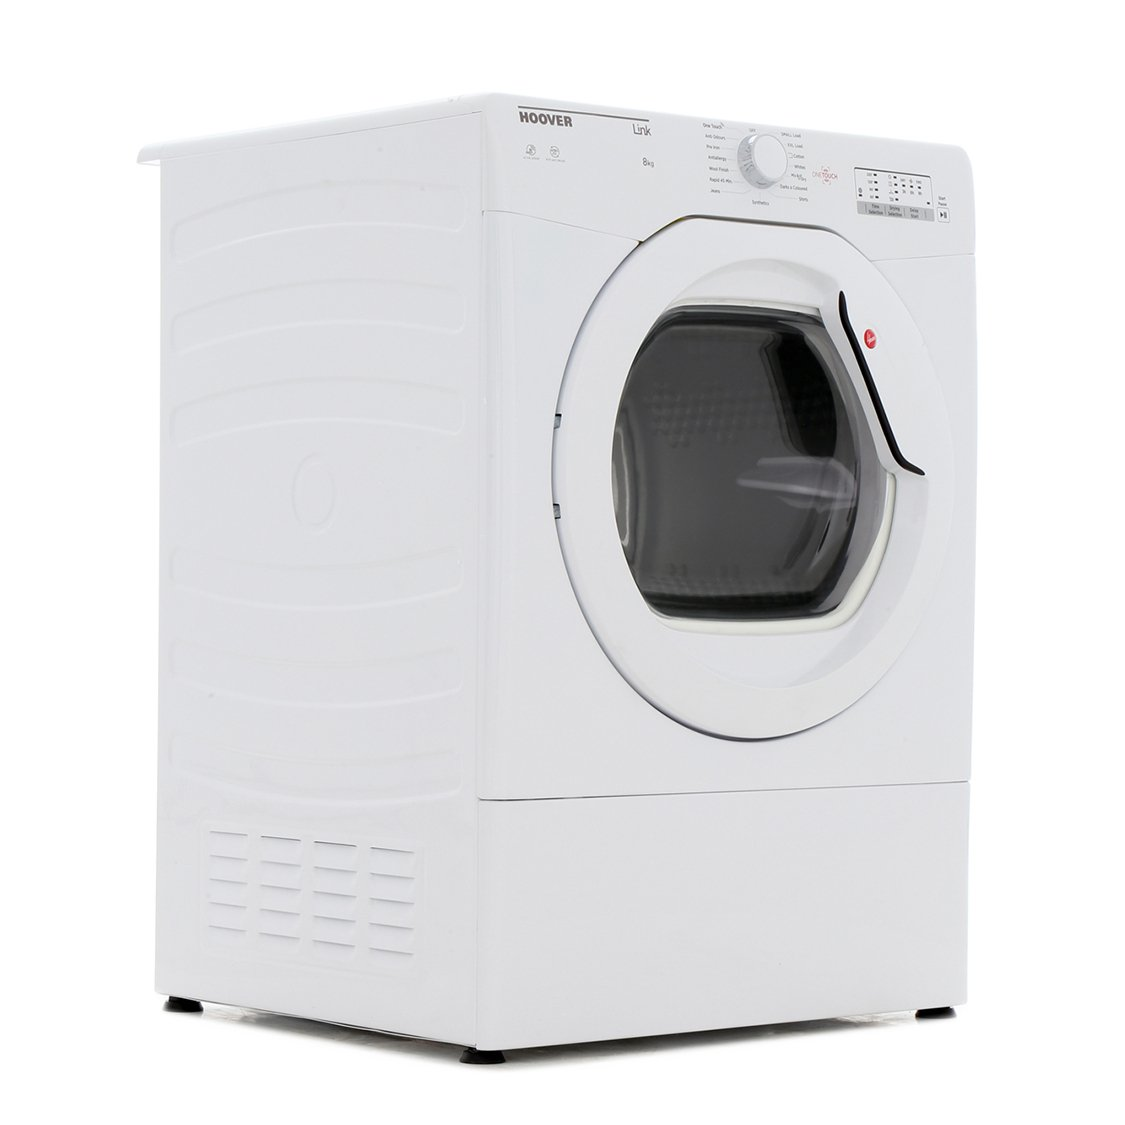 Hoover HLV8LG Vented Dryer